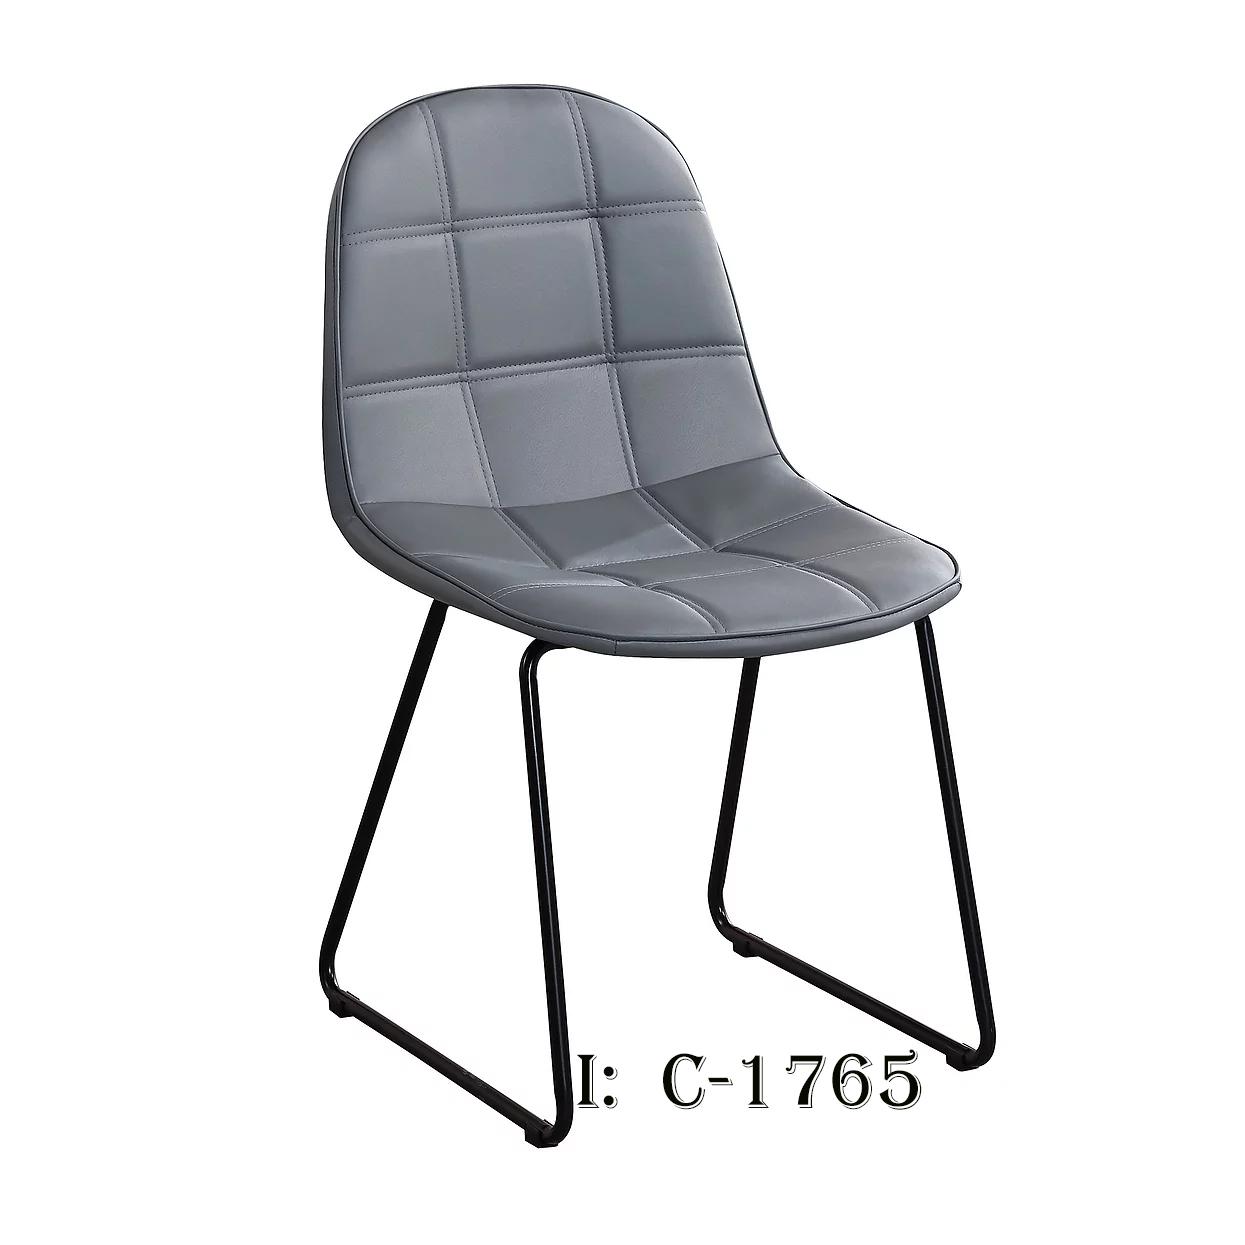 C-1765